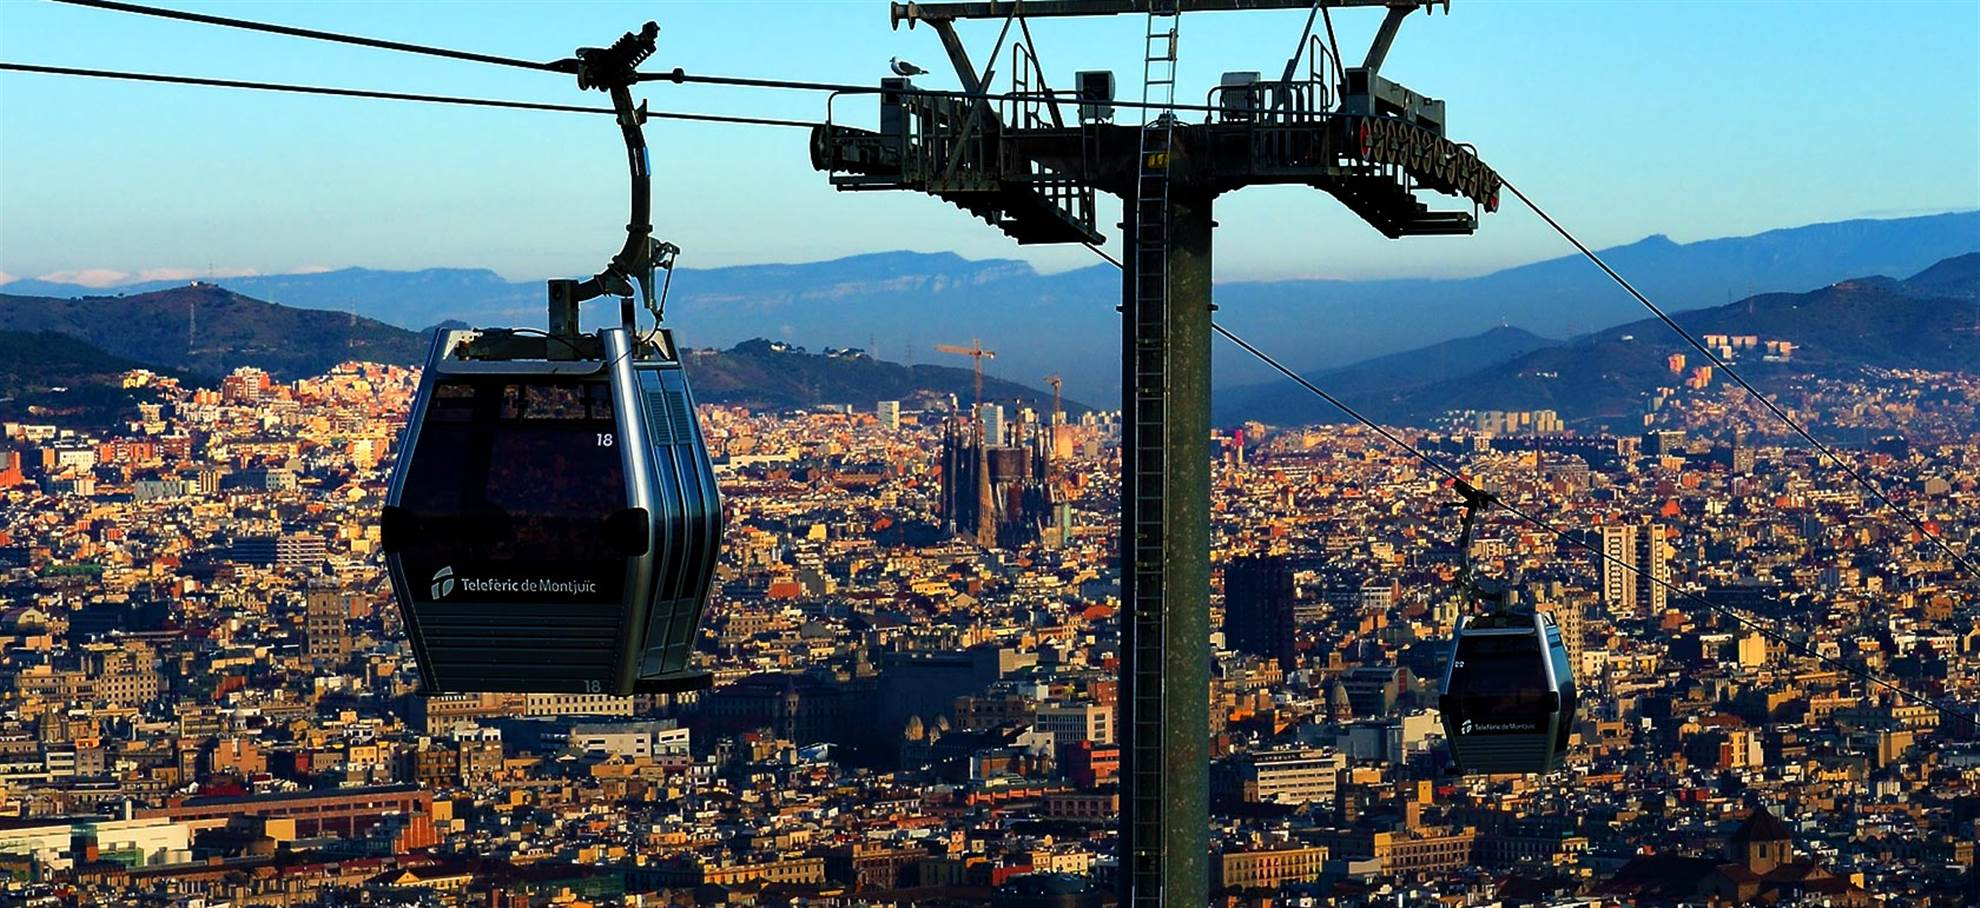 Télécabine  Barcelone - Teleferic de Montjuïc